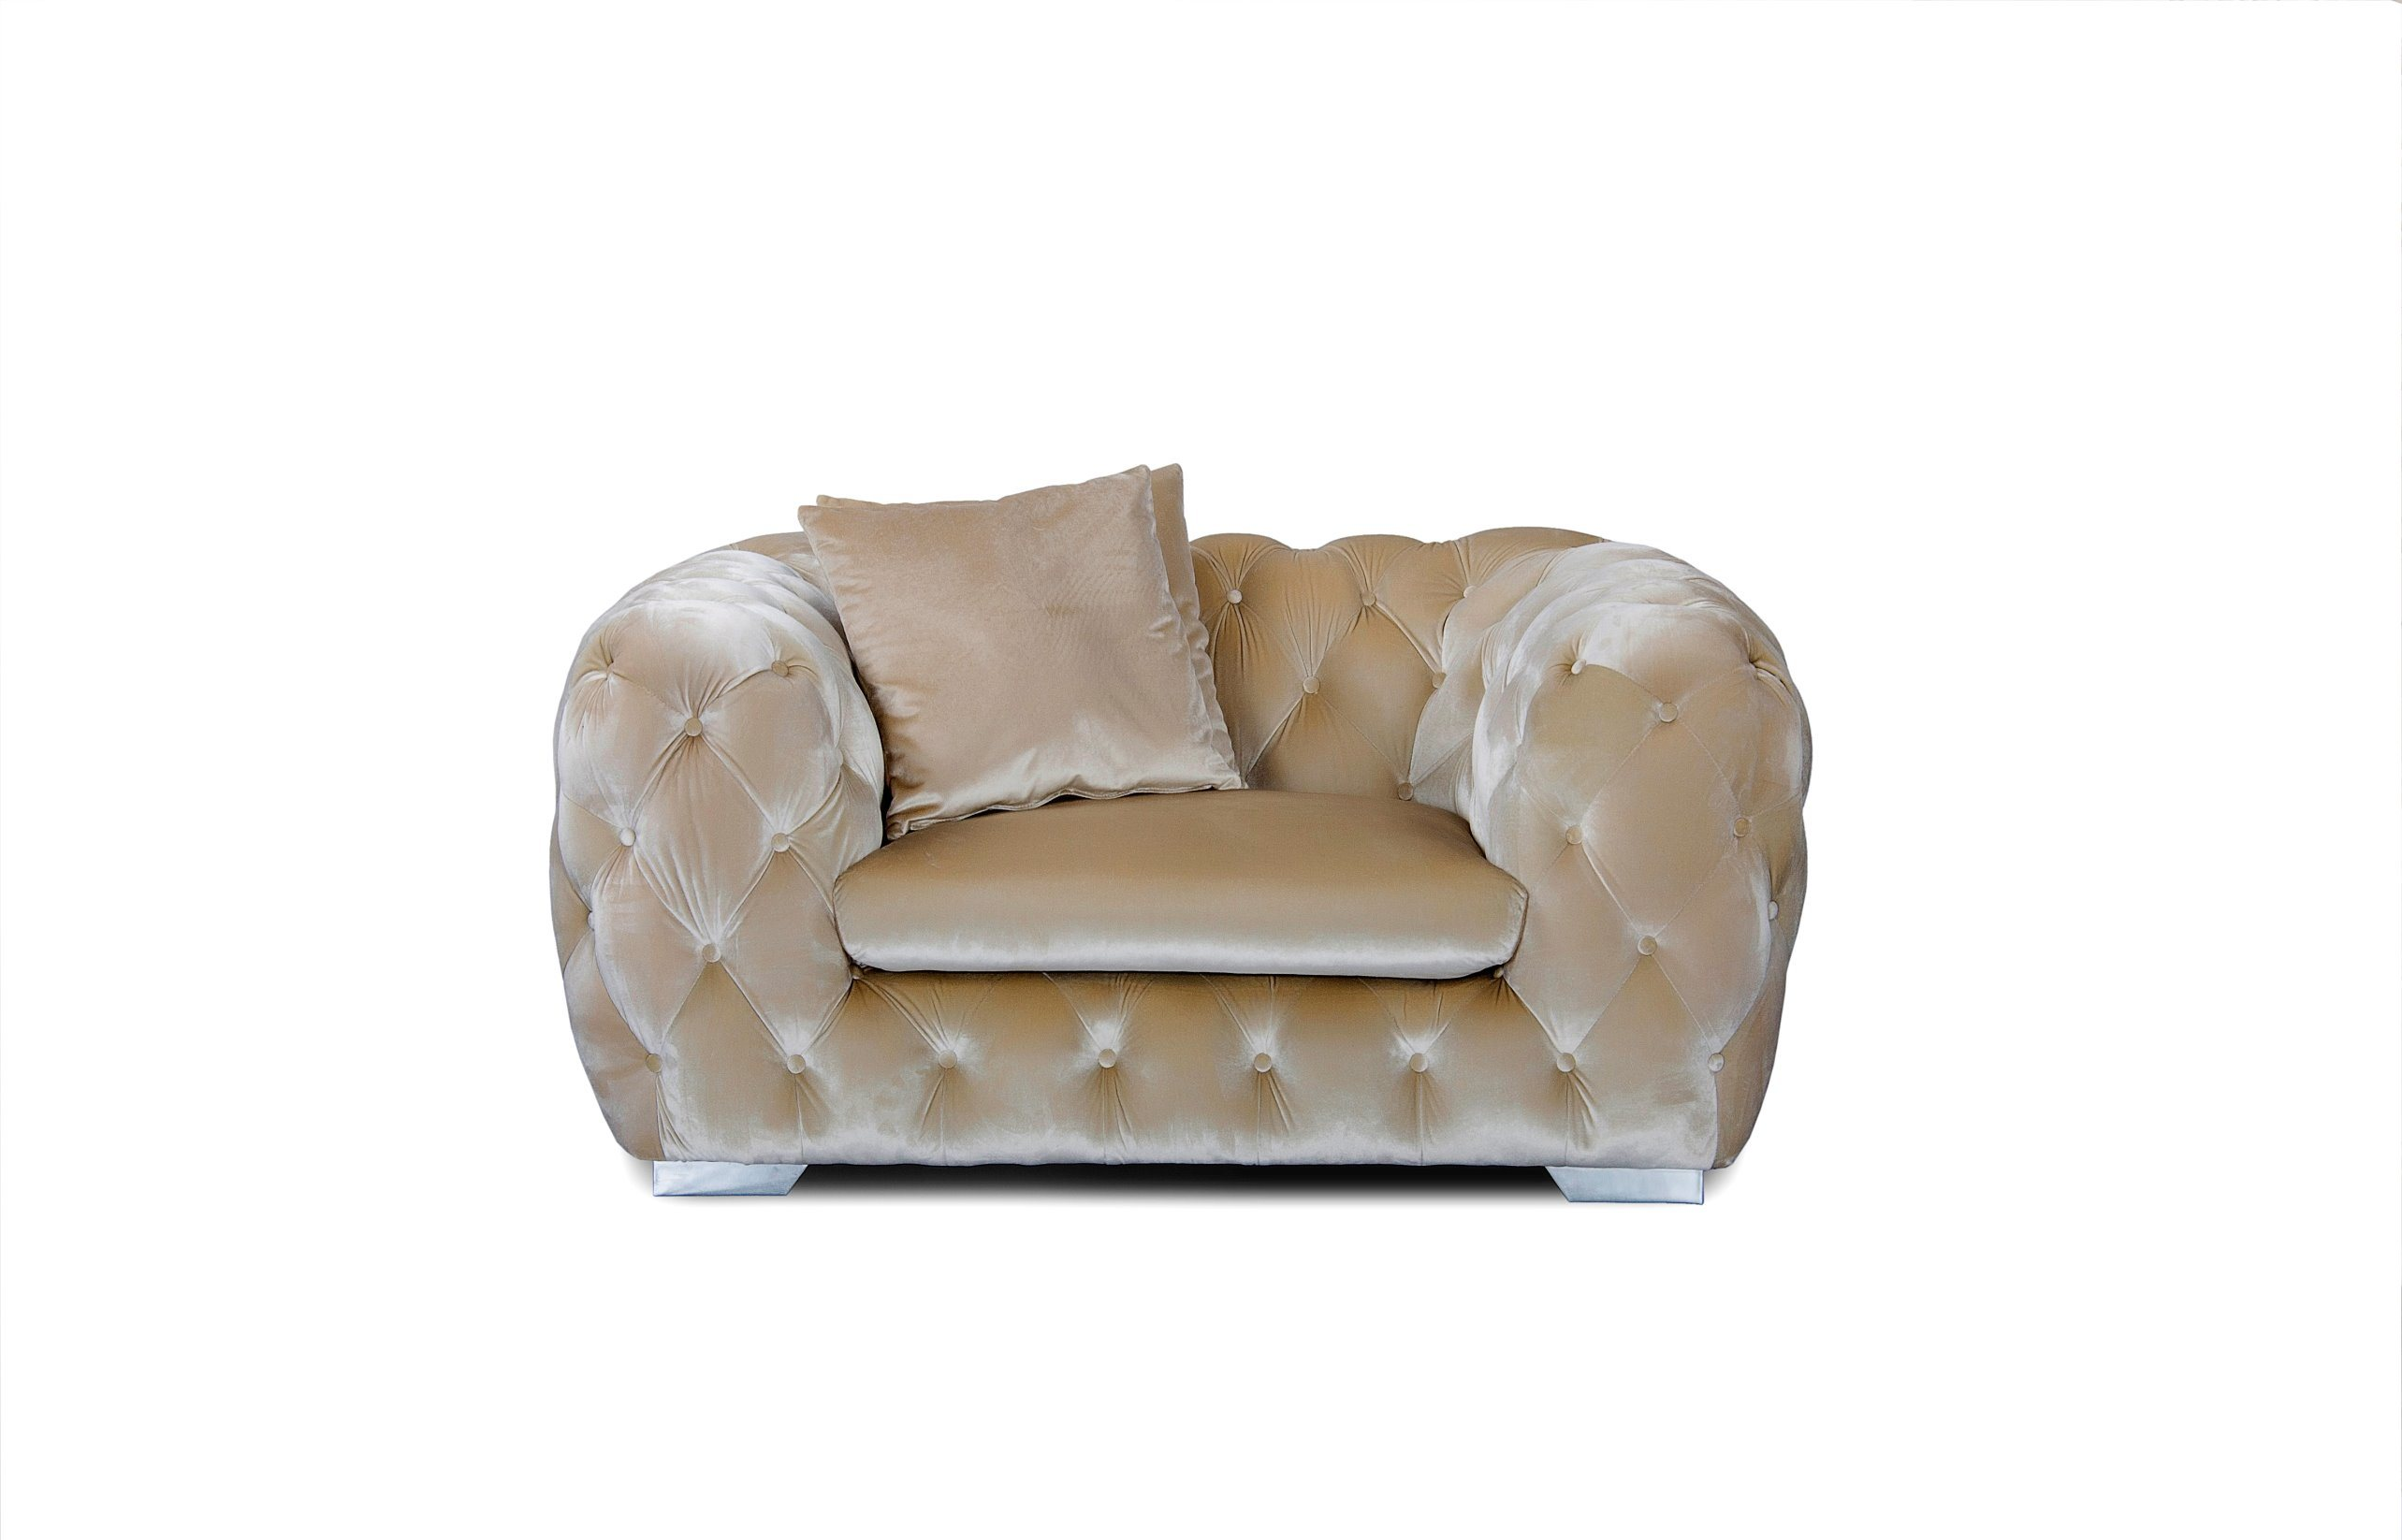 Hot Sale Modern Sofa Leahter Fabric Living Room Furniture